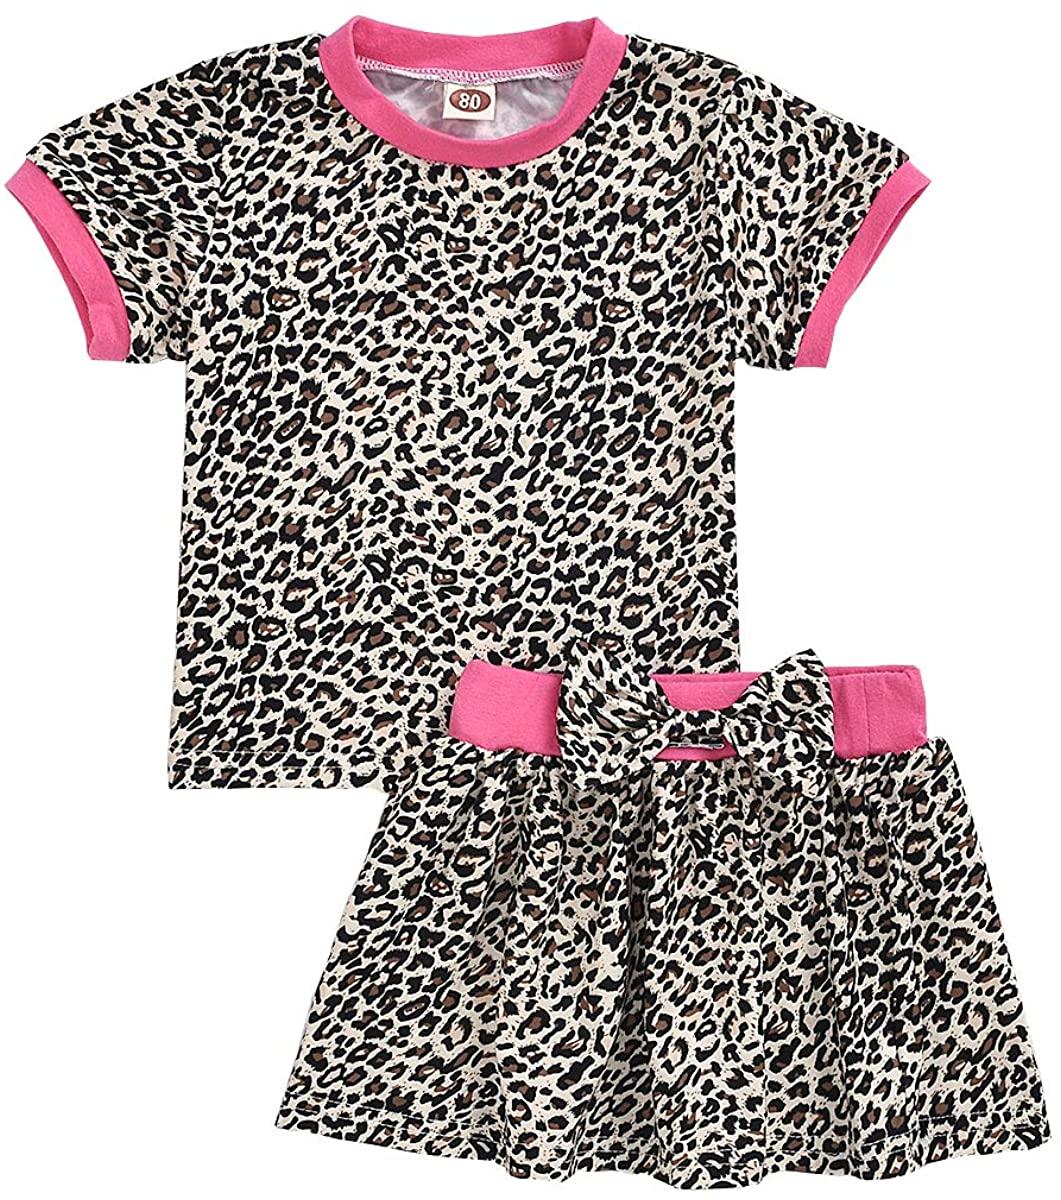 Toddler Baby Girls Summer Skirt Clothes Leopard Short Sleeve Shirt+Bowknot Skirts 2Pcs Outfits Set